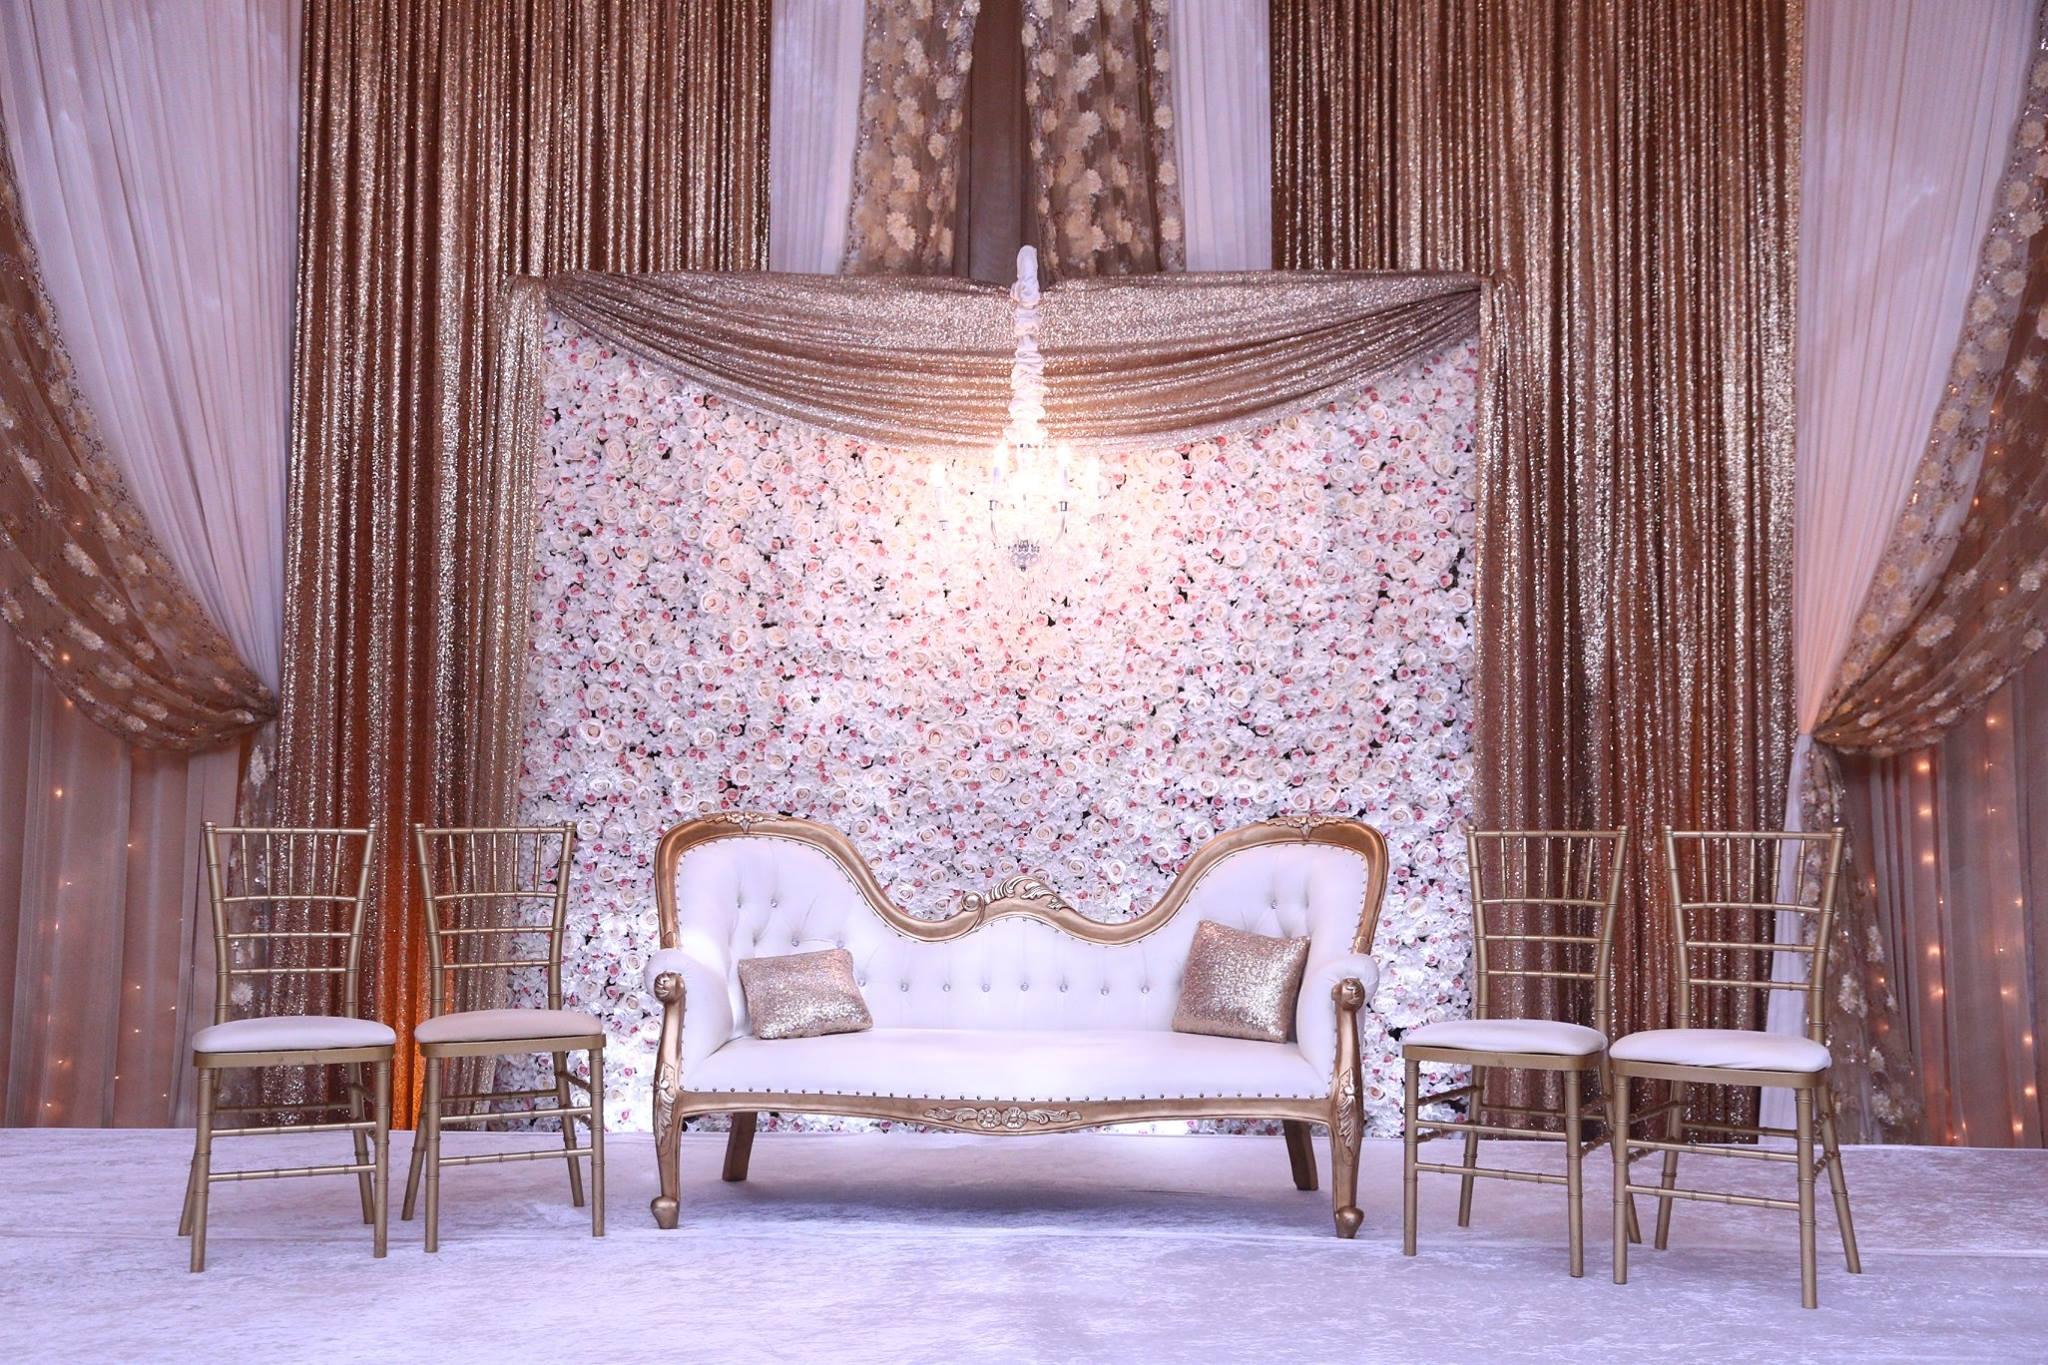 Blush Flower Wall & Chandelier